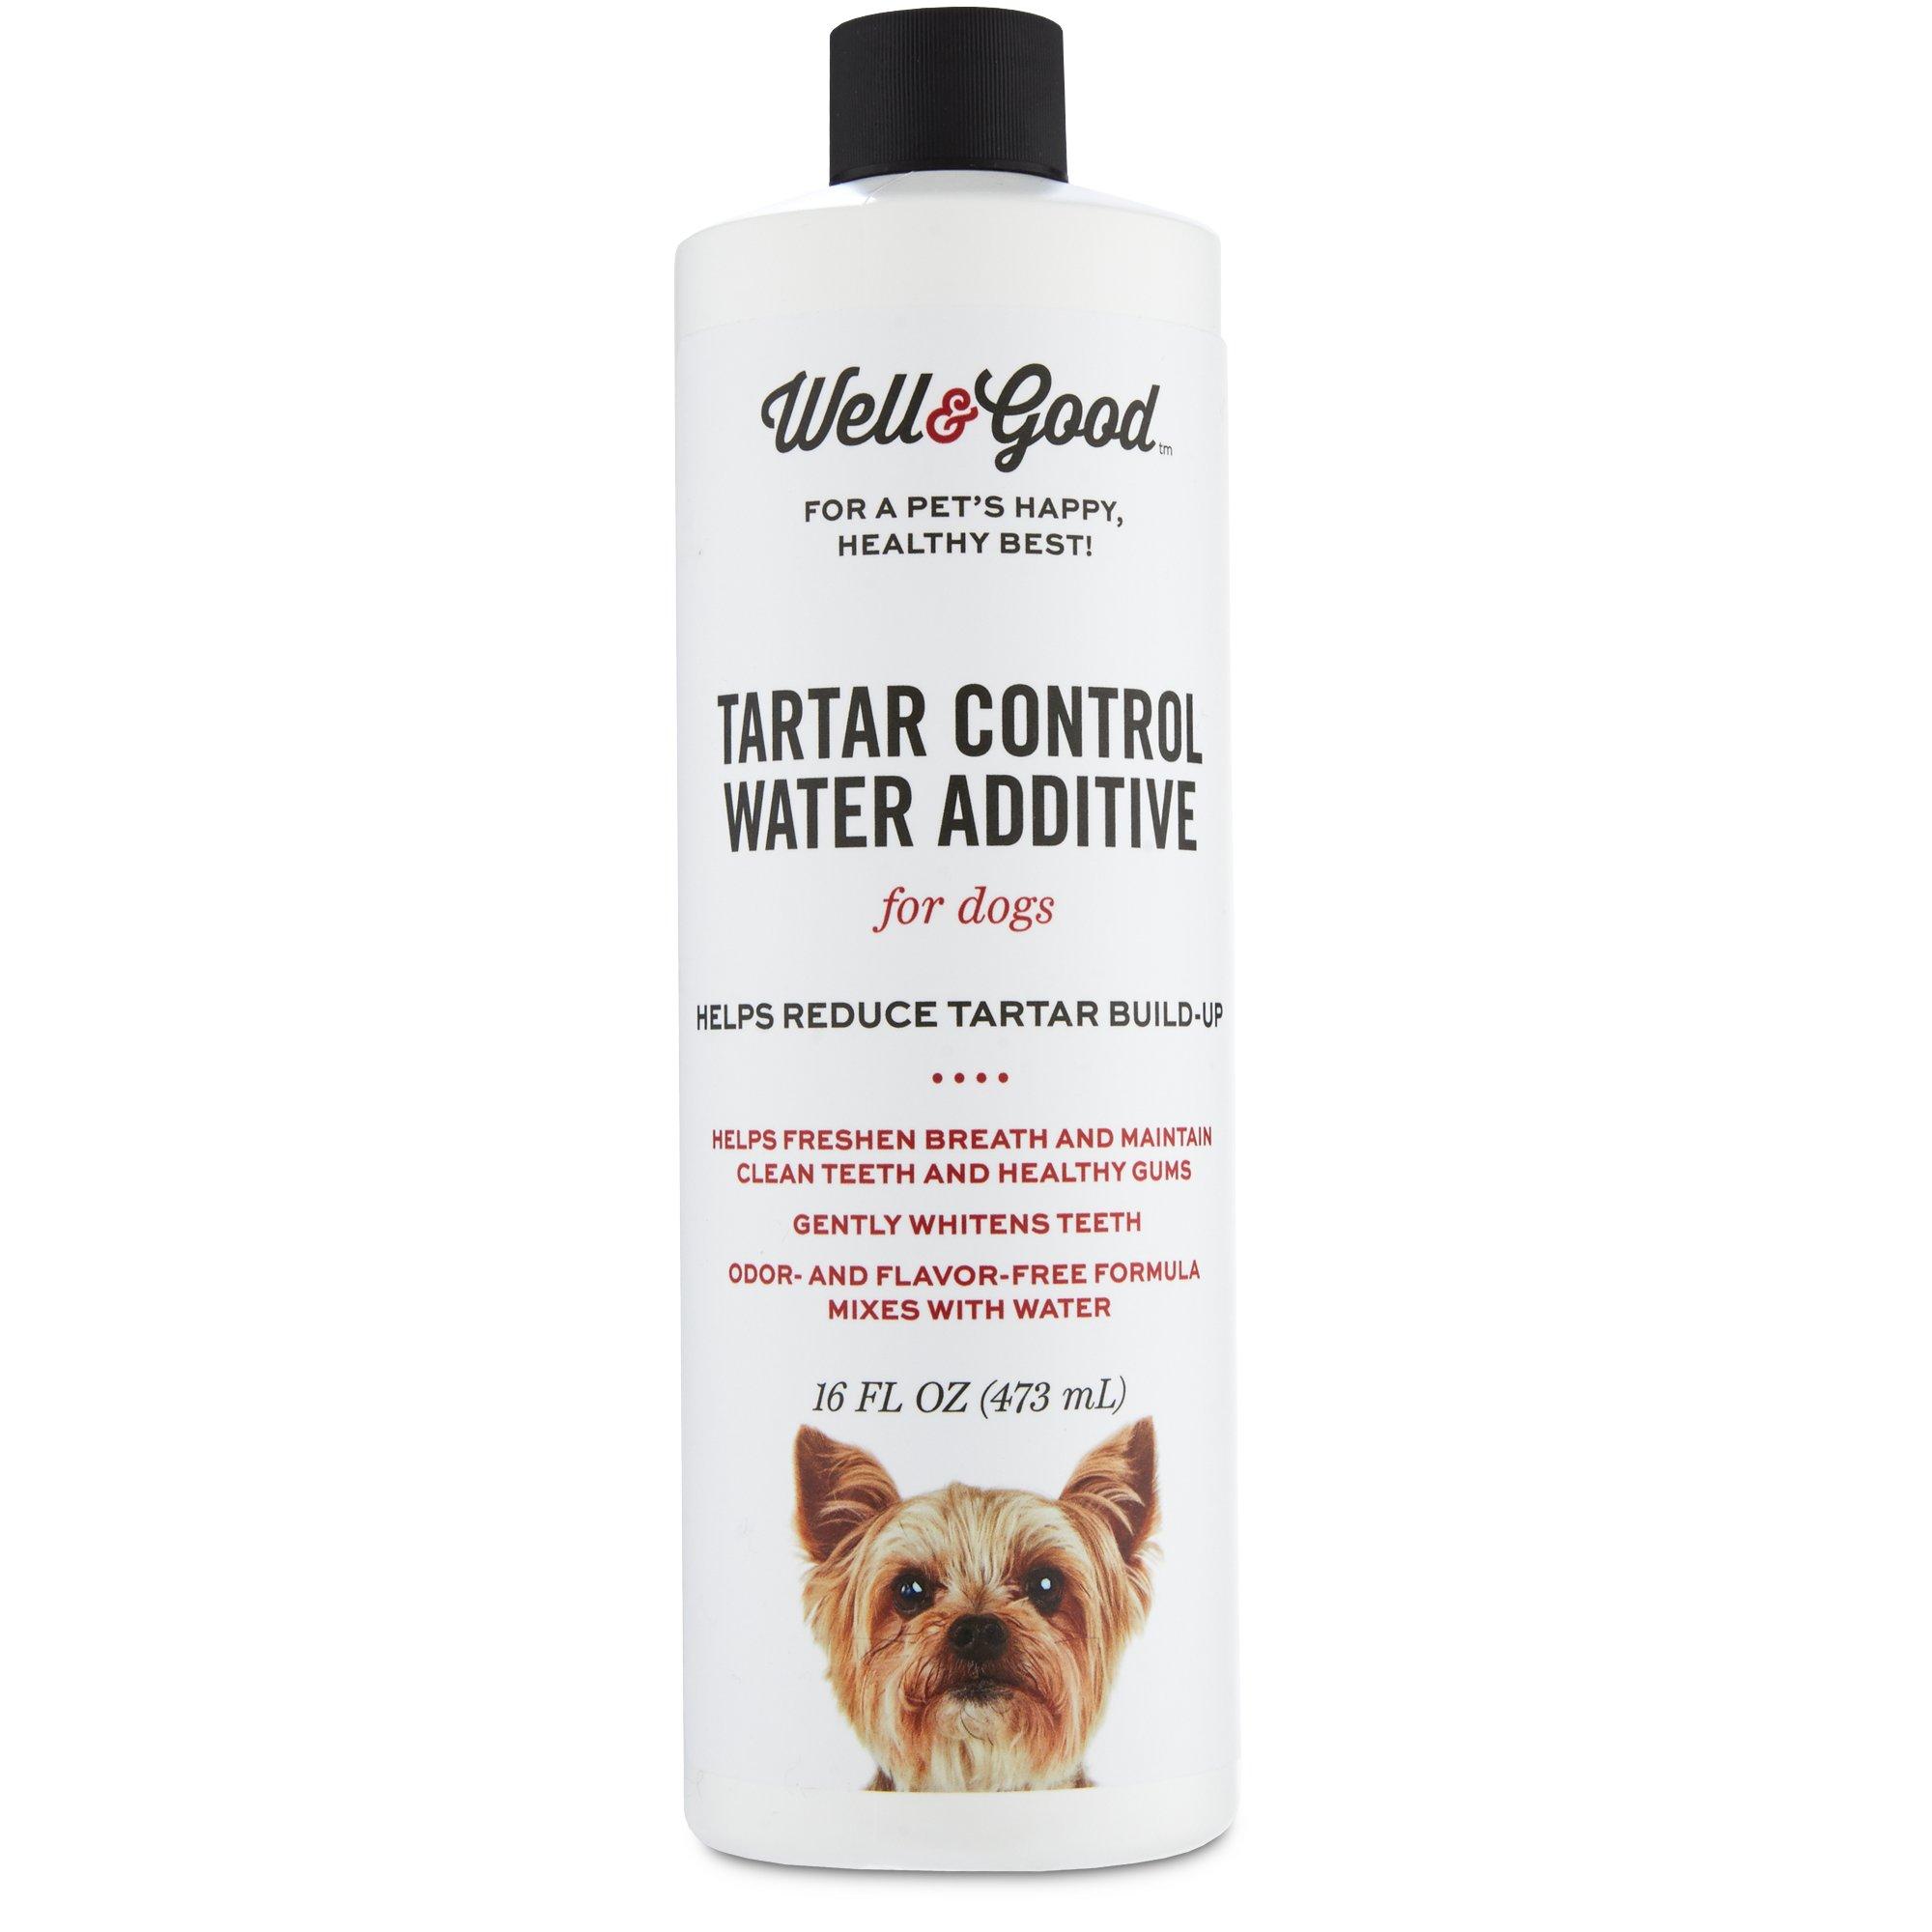 Dry Dog Food For Tartar Control